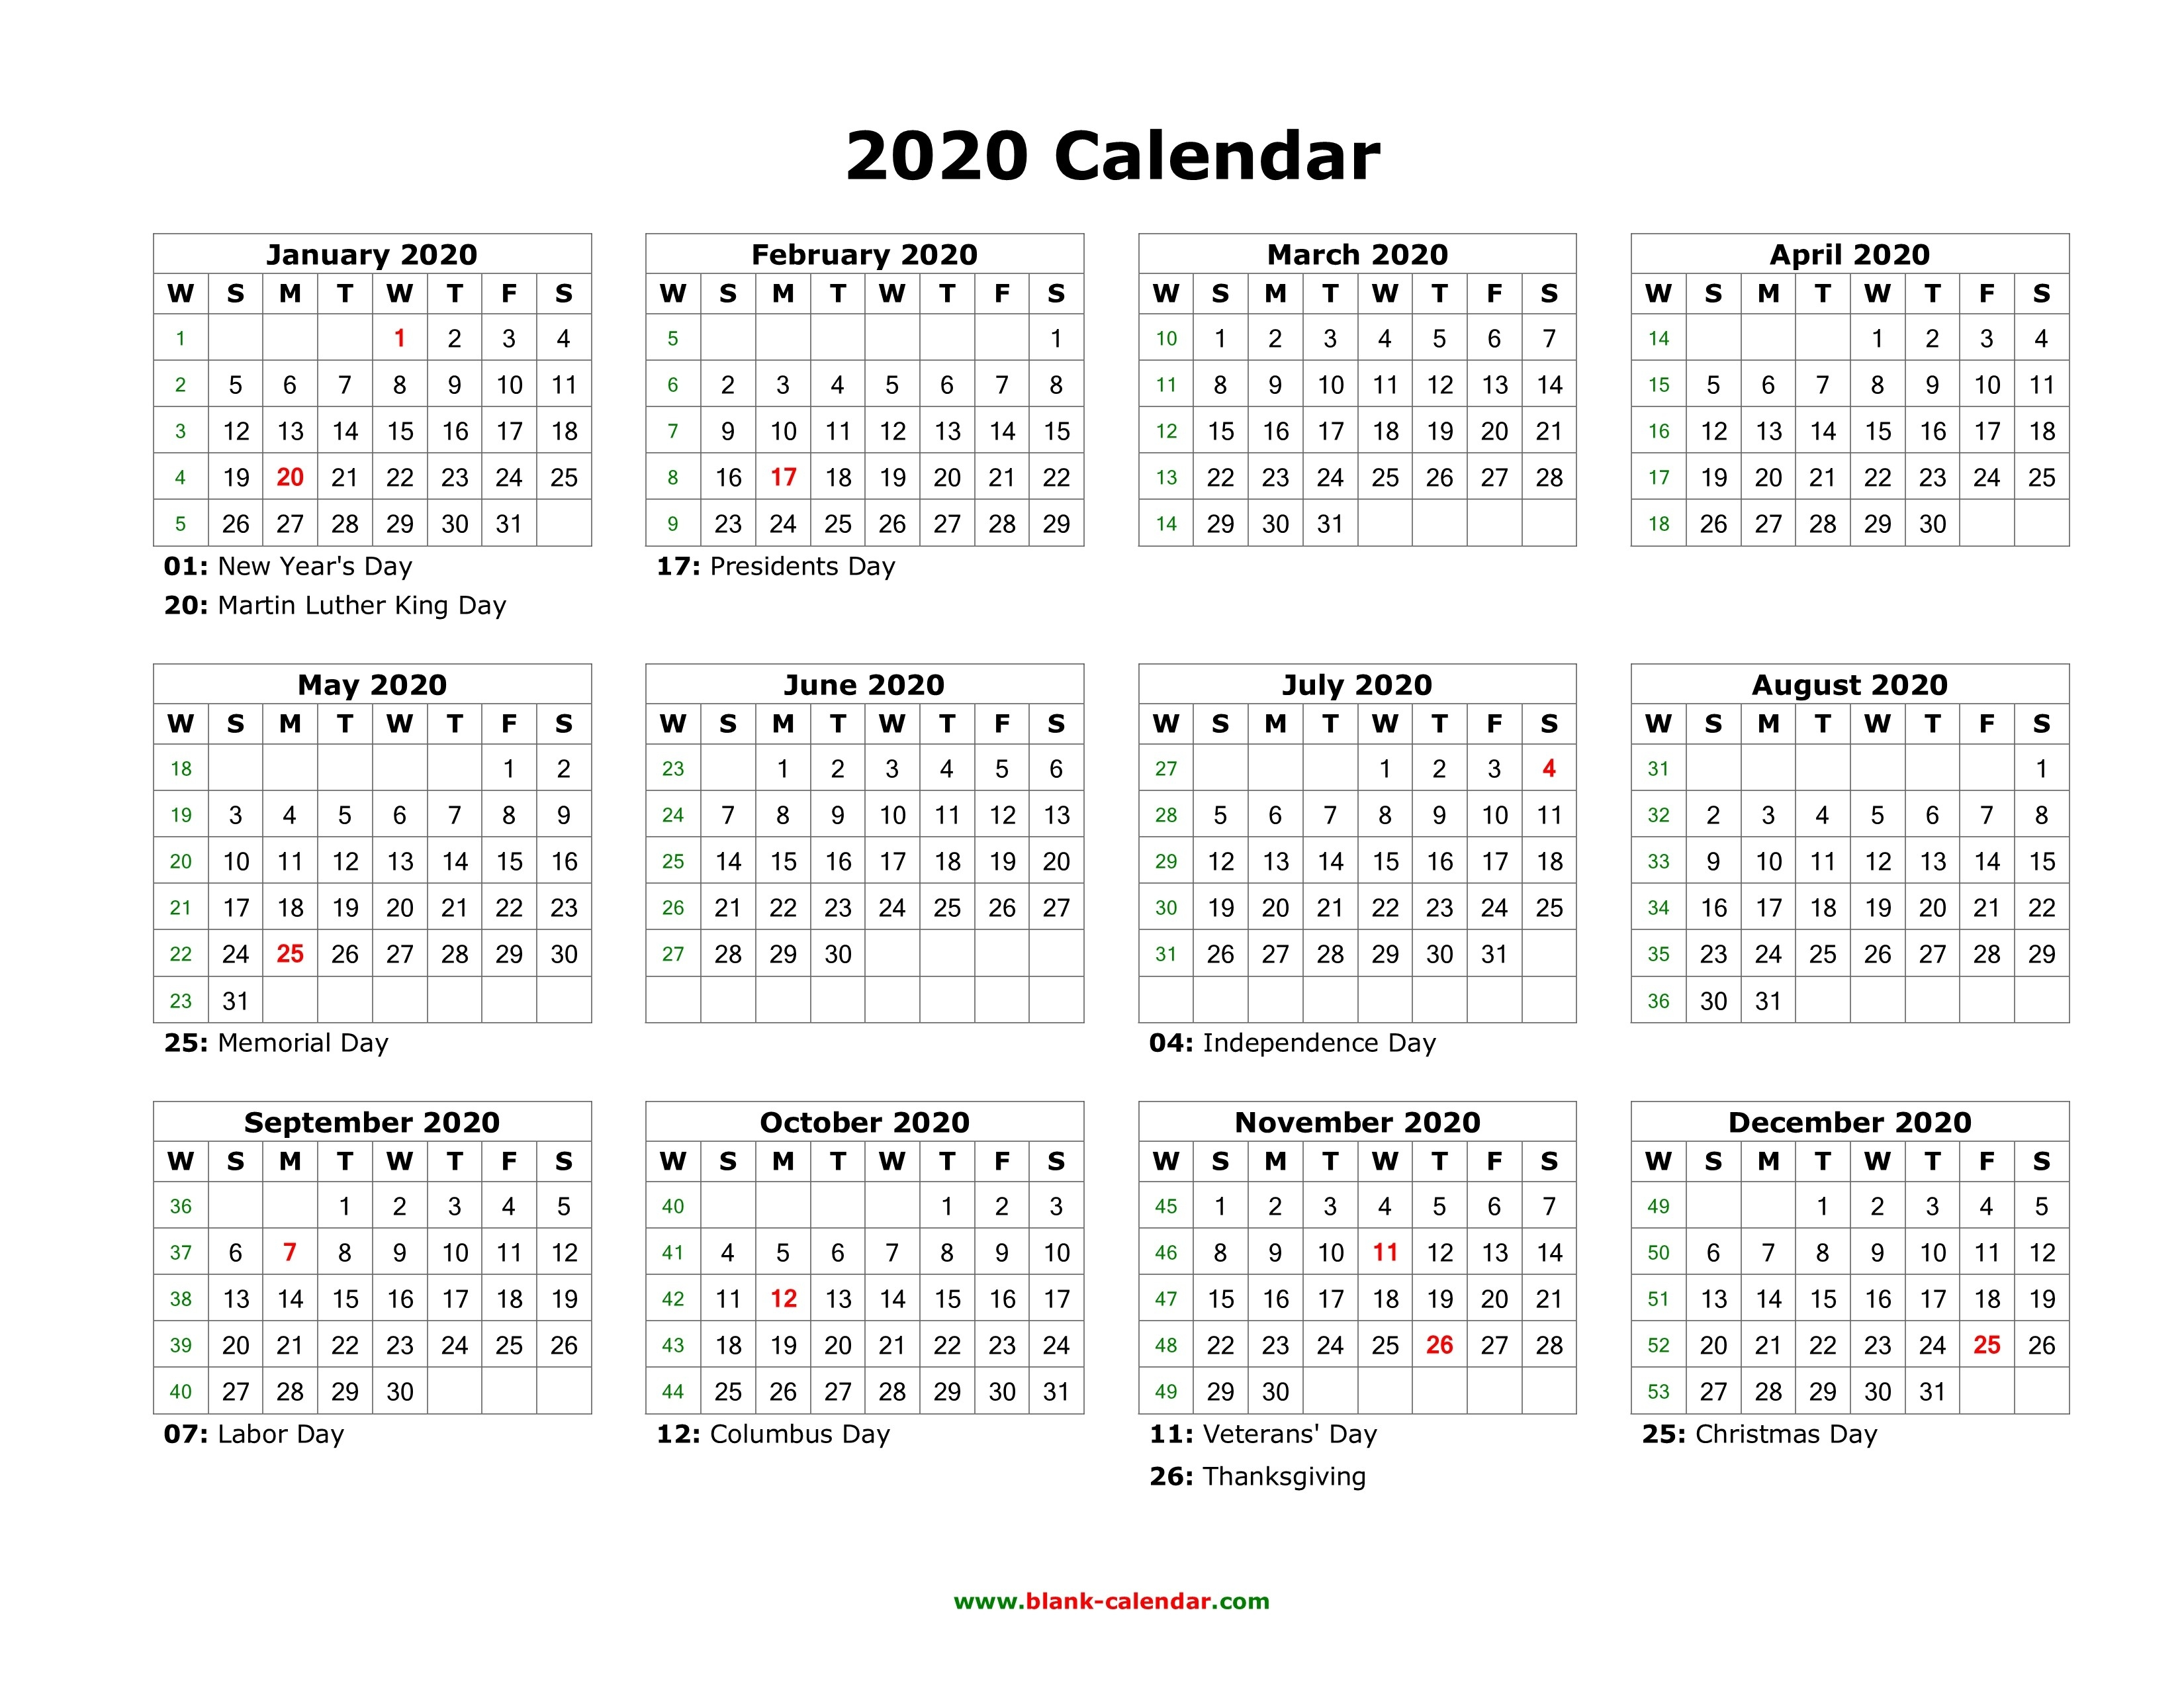 Blank Calendar 2020 | Free Download Calendar Templates-Indesign 2020 Calendar Template